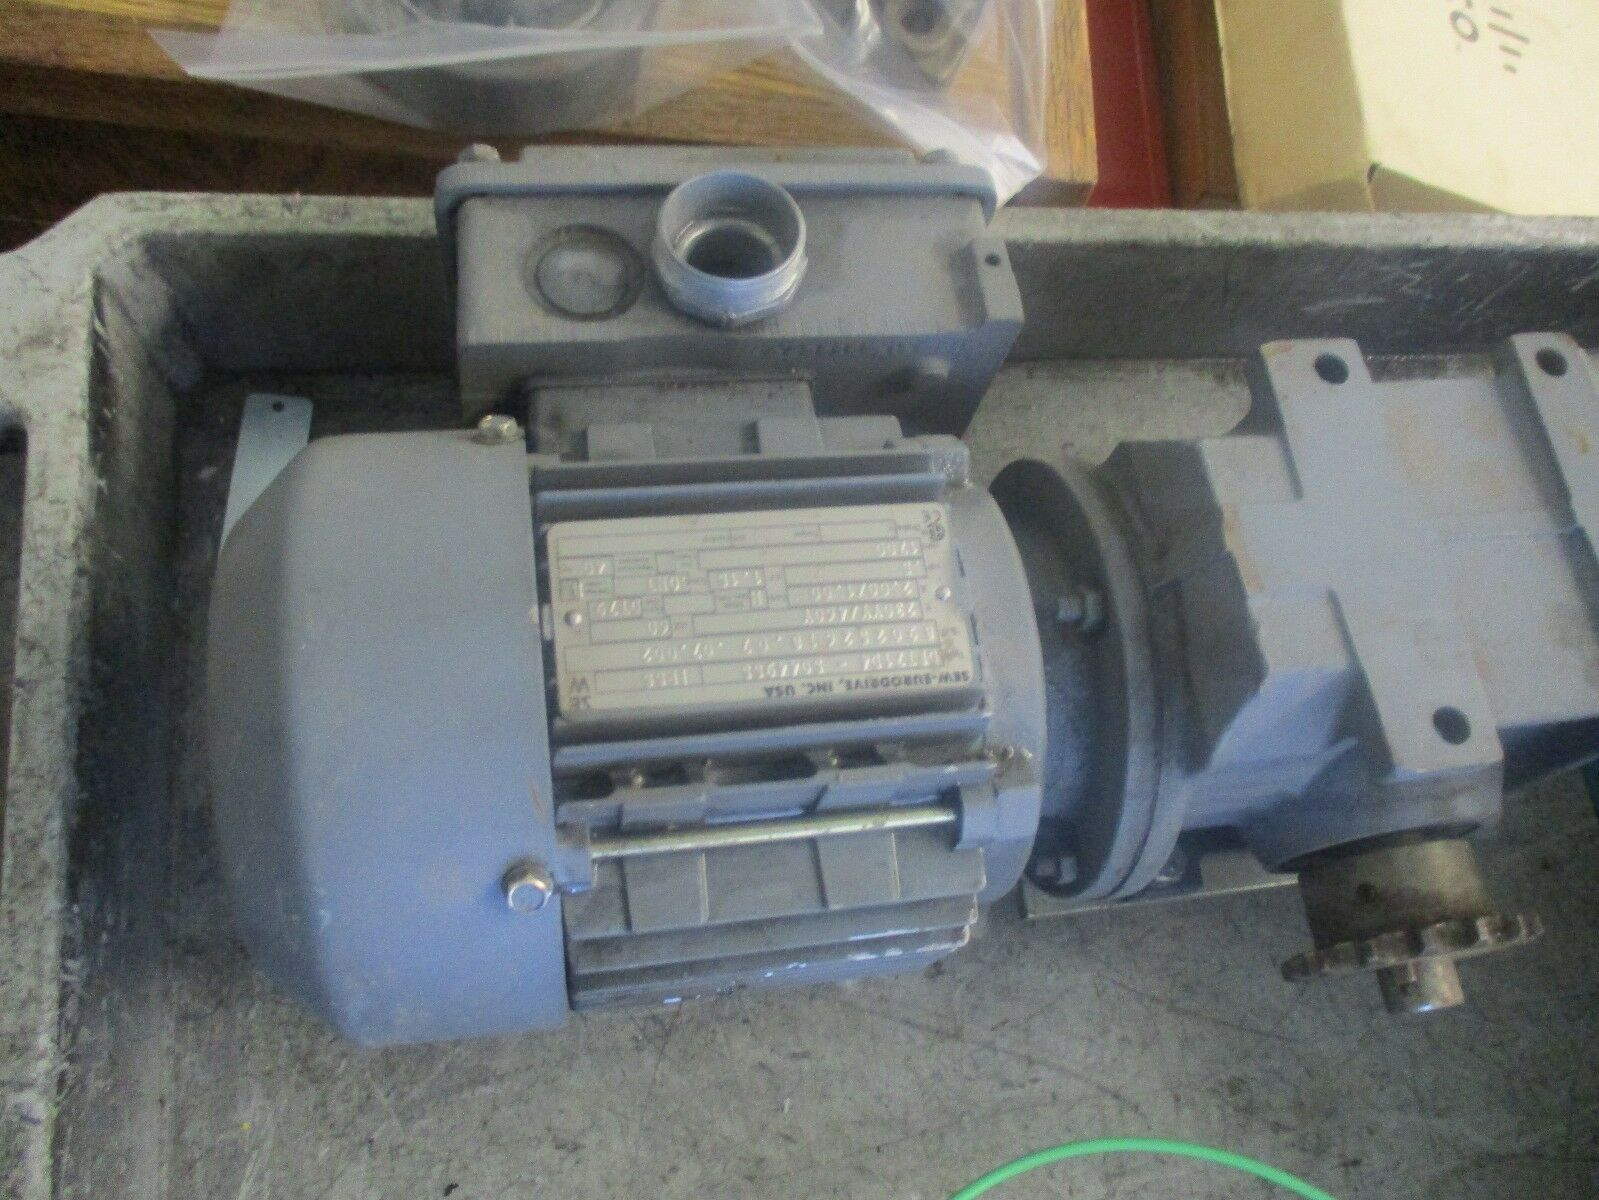 Sew-Eurodrive Model  DFT71D4-5044955 Motor with  Reducer